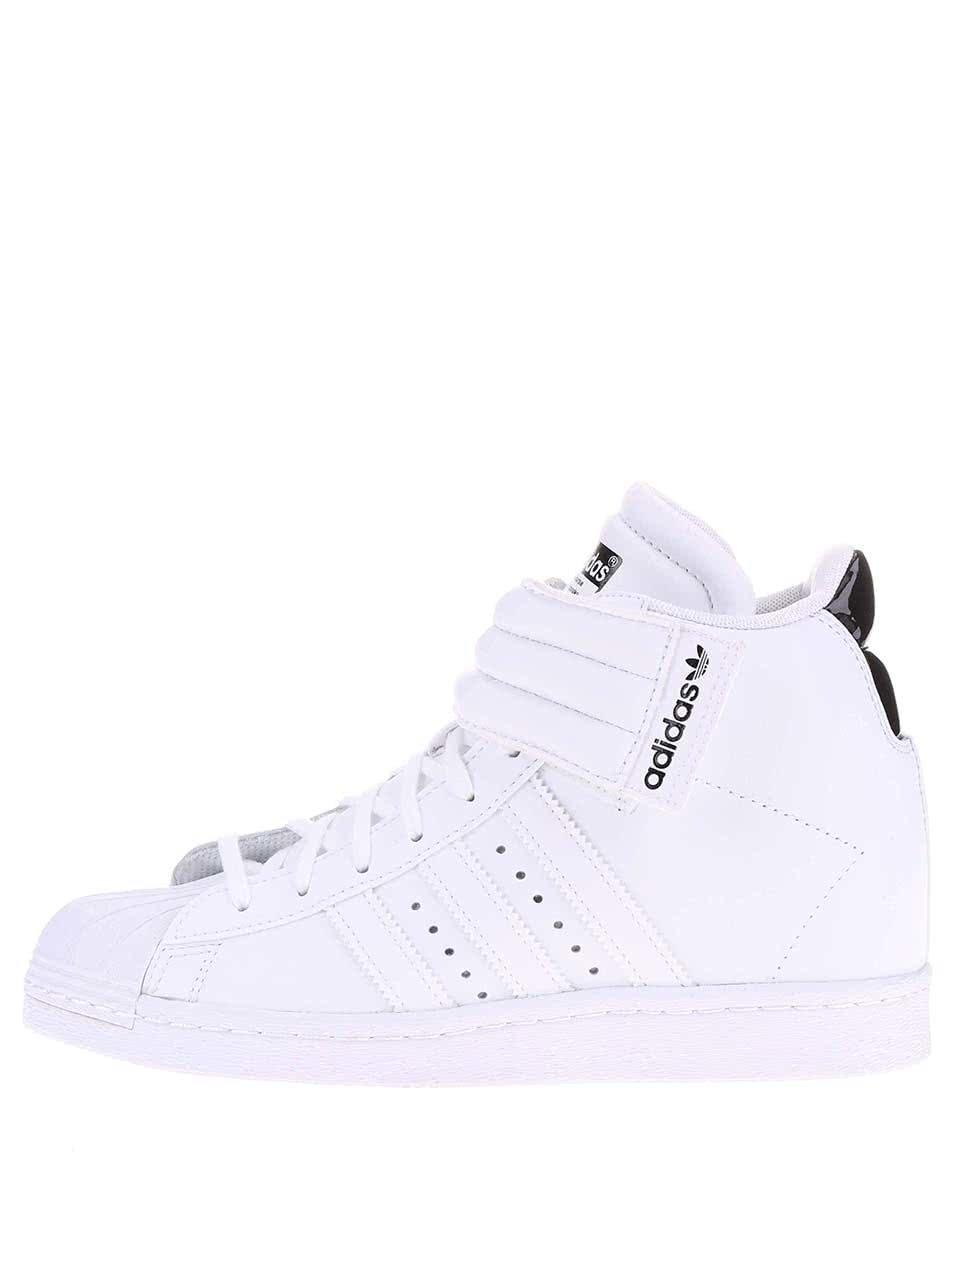 Biele dámske členkové tenisky adidas Originals Superstar UP Strap ... 7eb92f1d28e